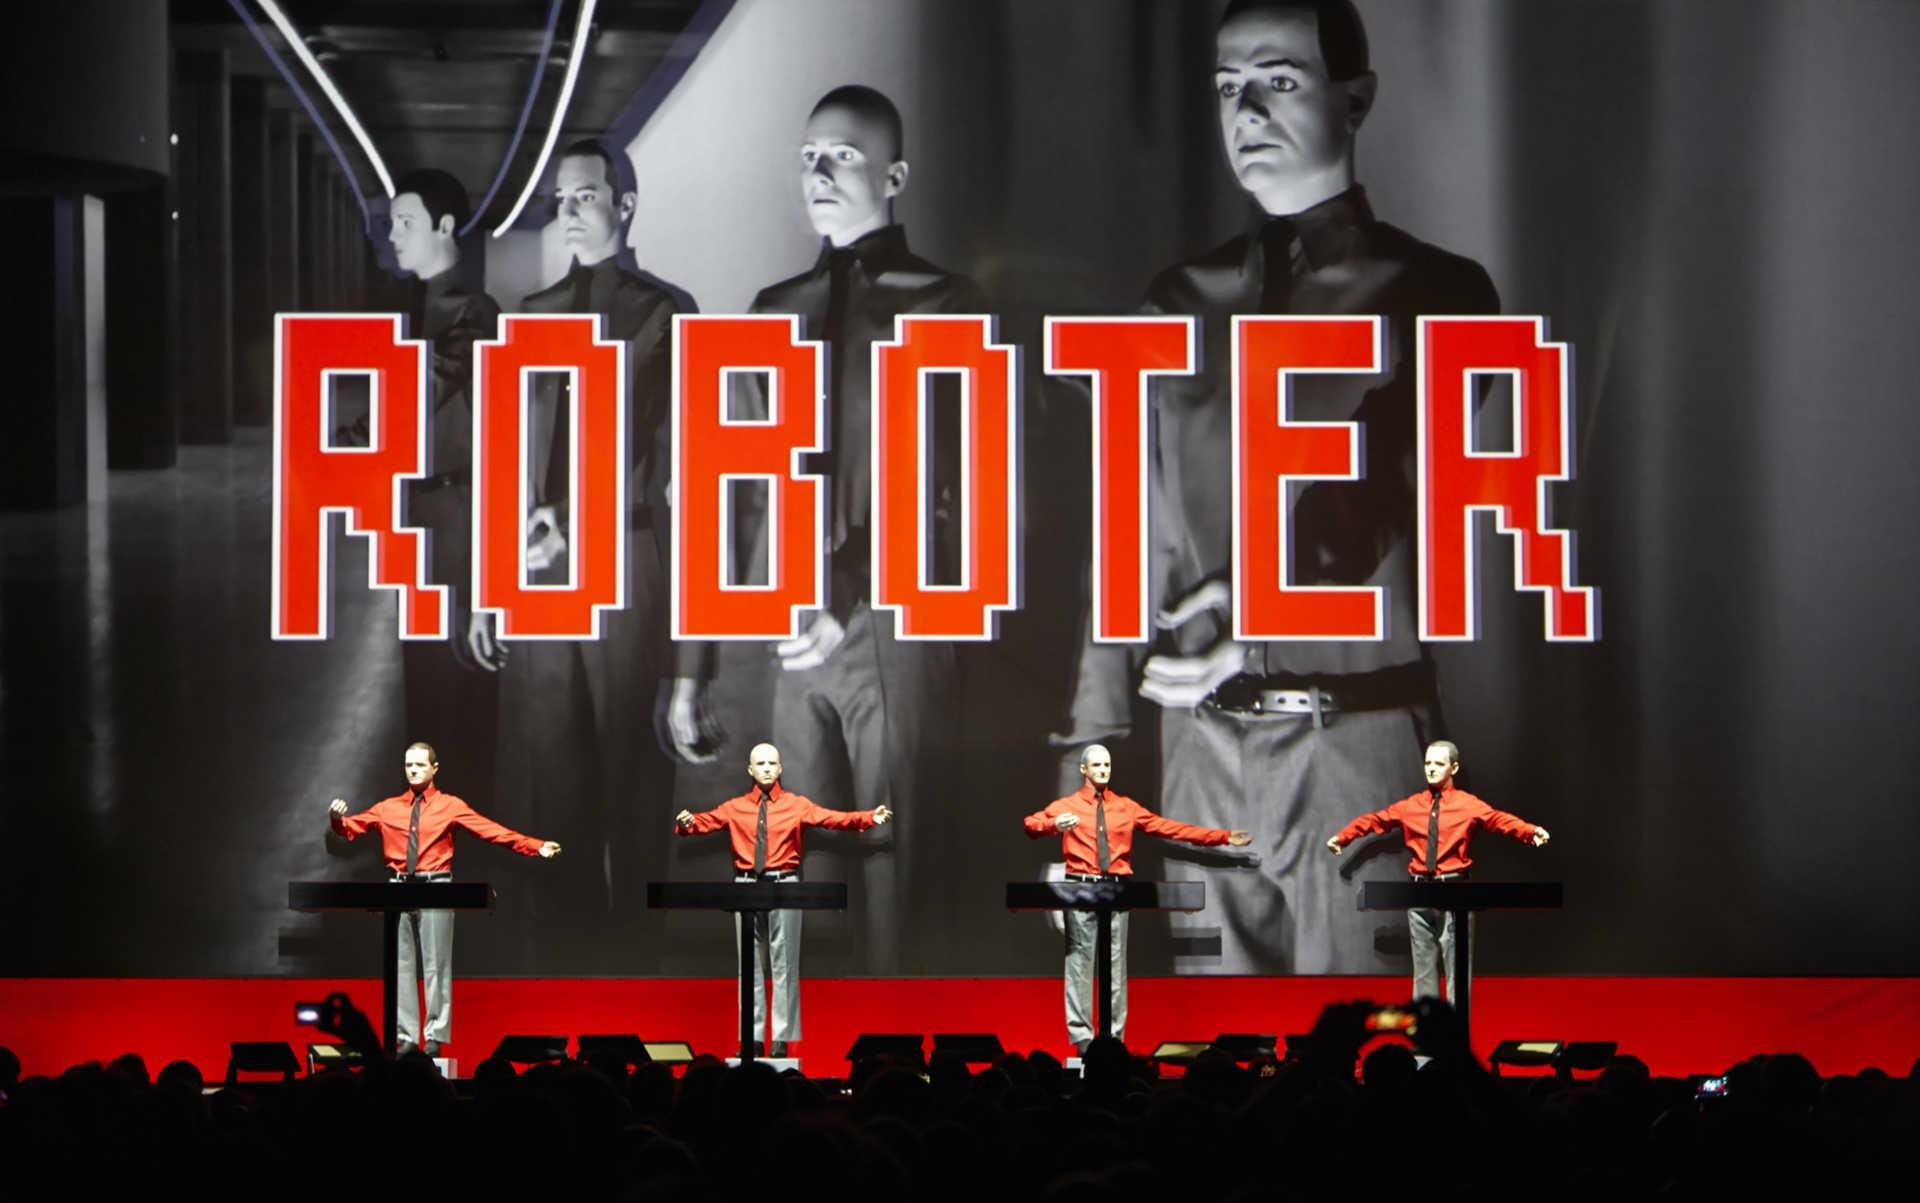 Kraftwerk – Roboter © Peter Boettcher